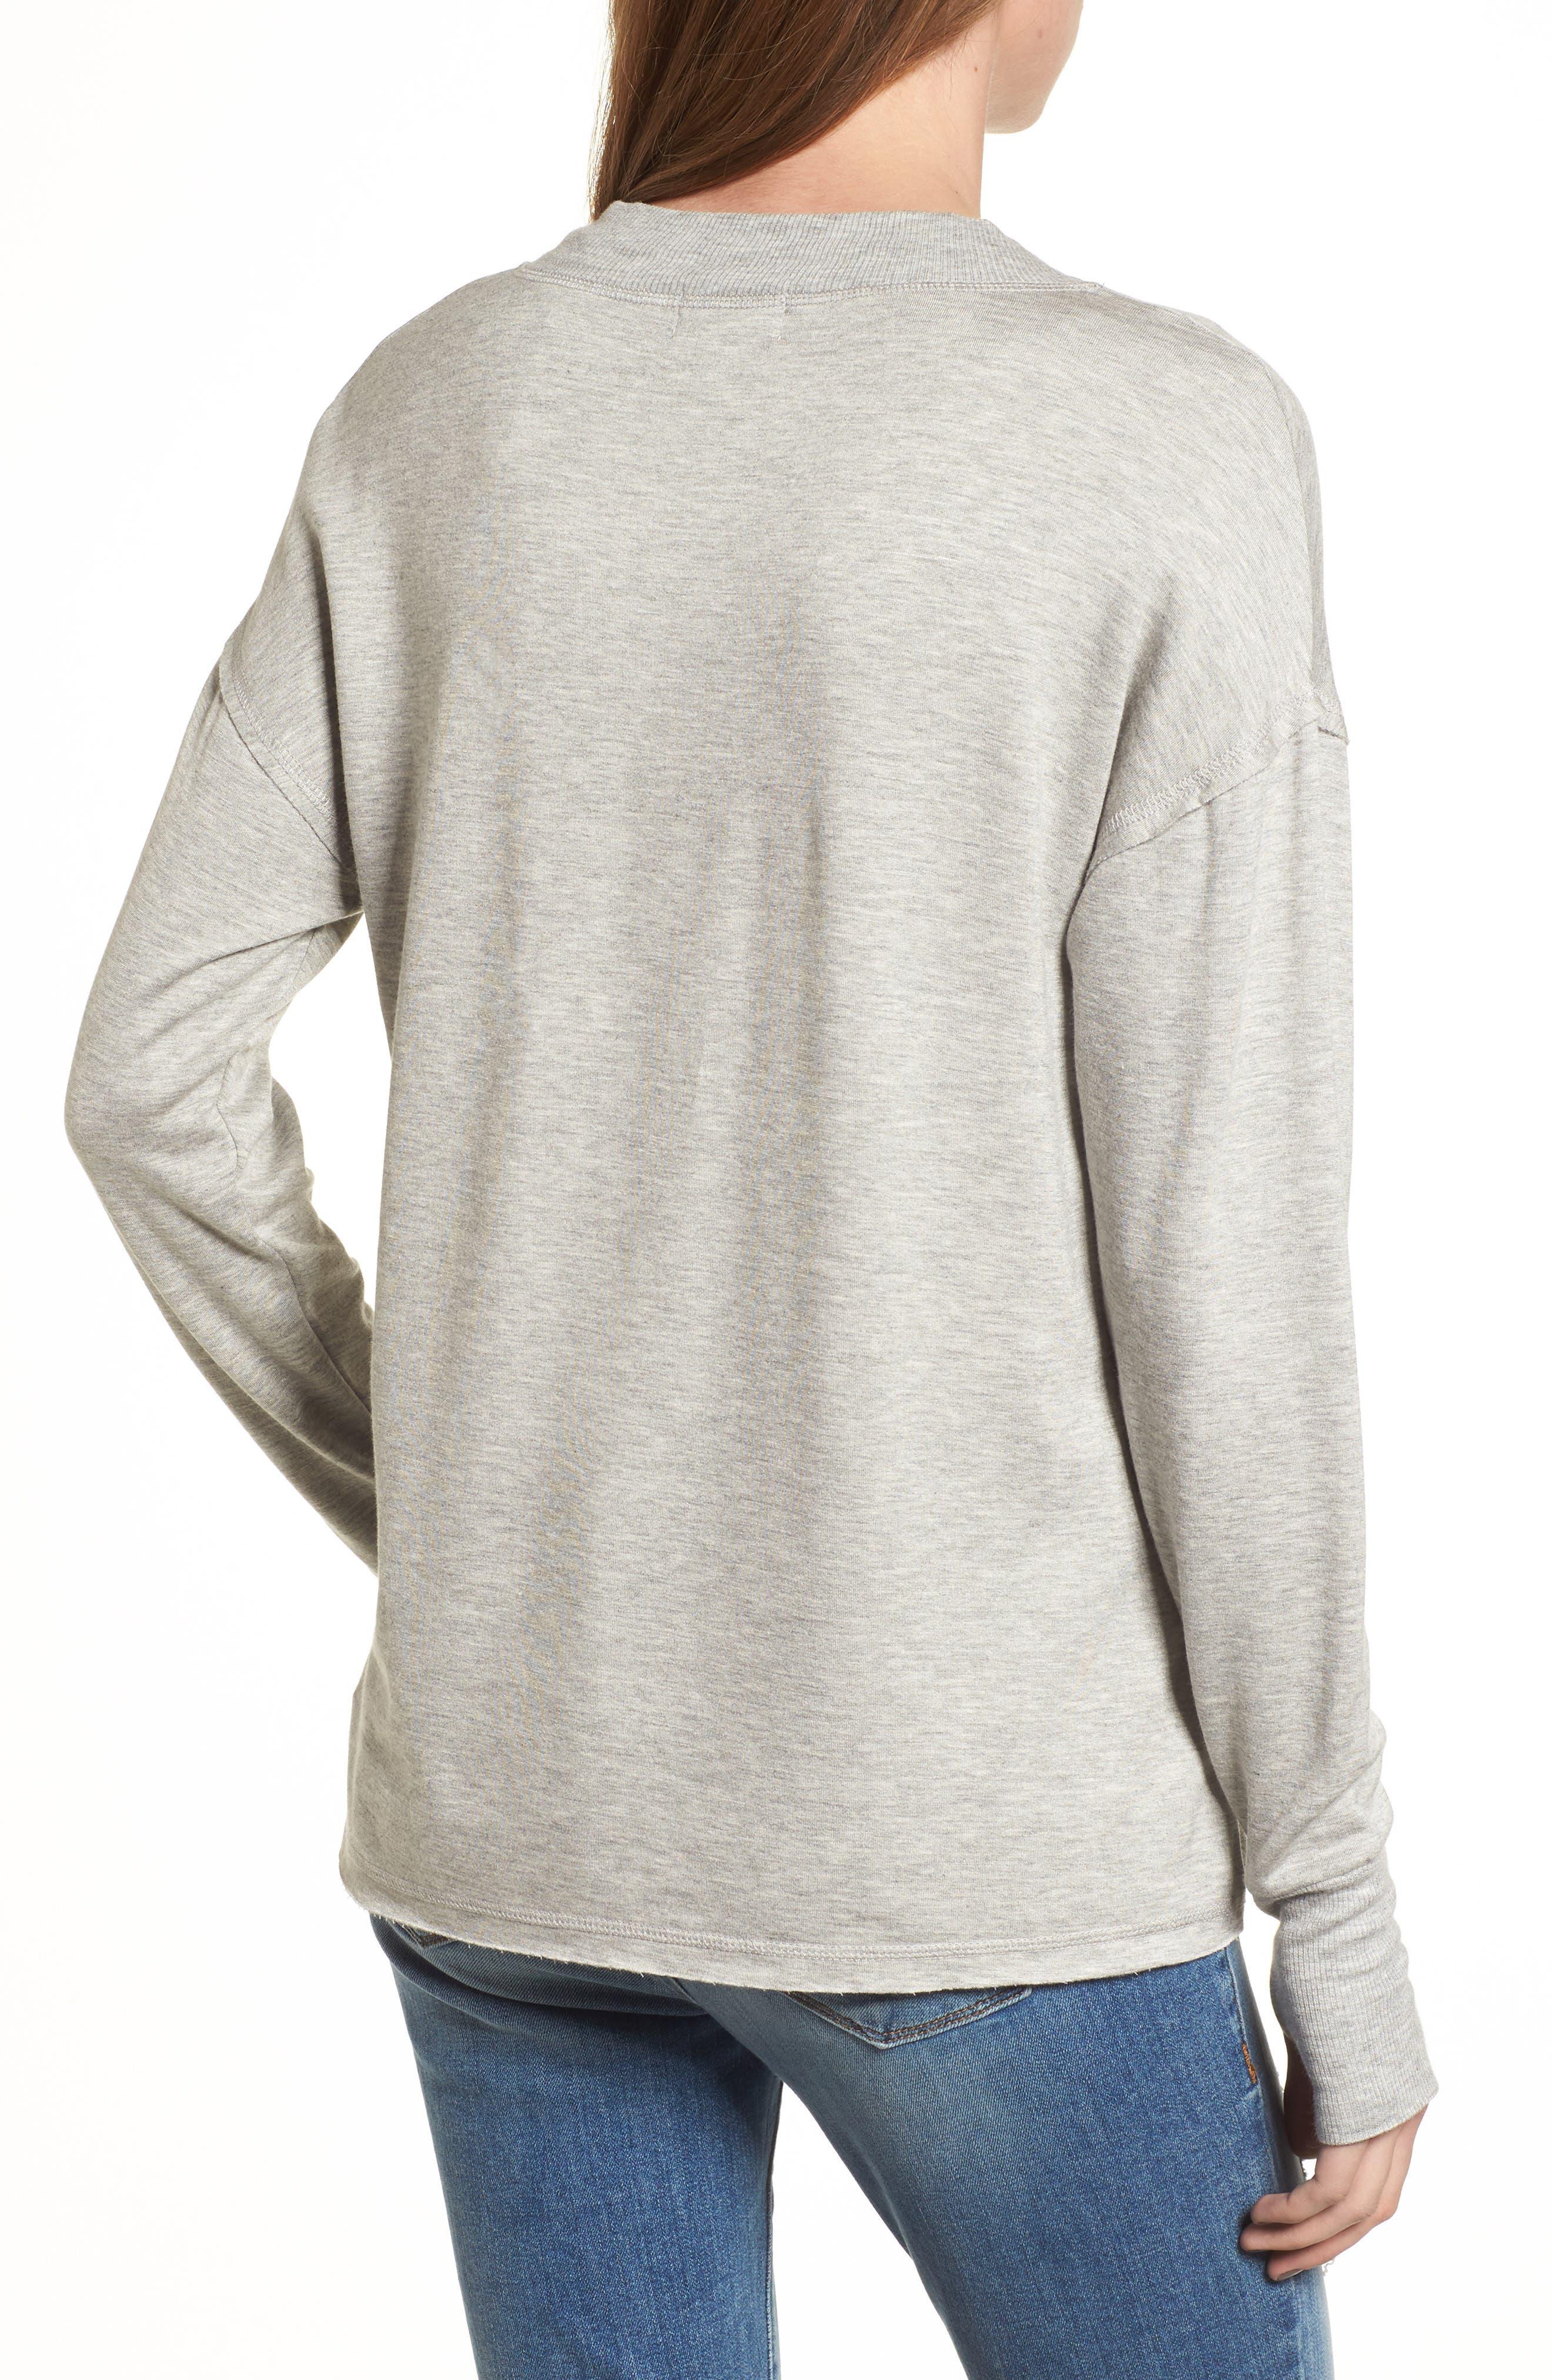 Thumbhole Cuff Sweater,                             Alternate thumbnail 2, color,                             Grey